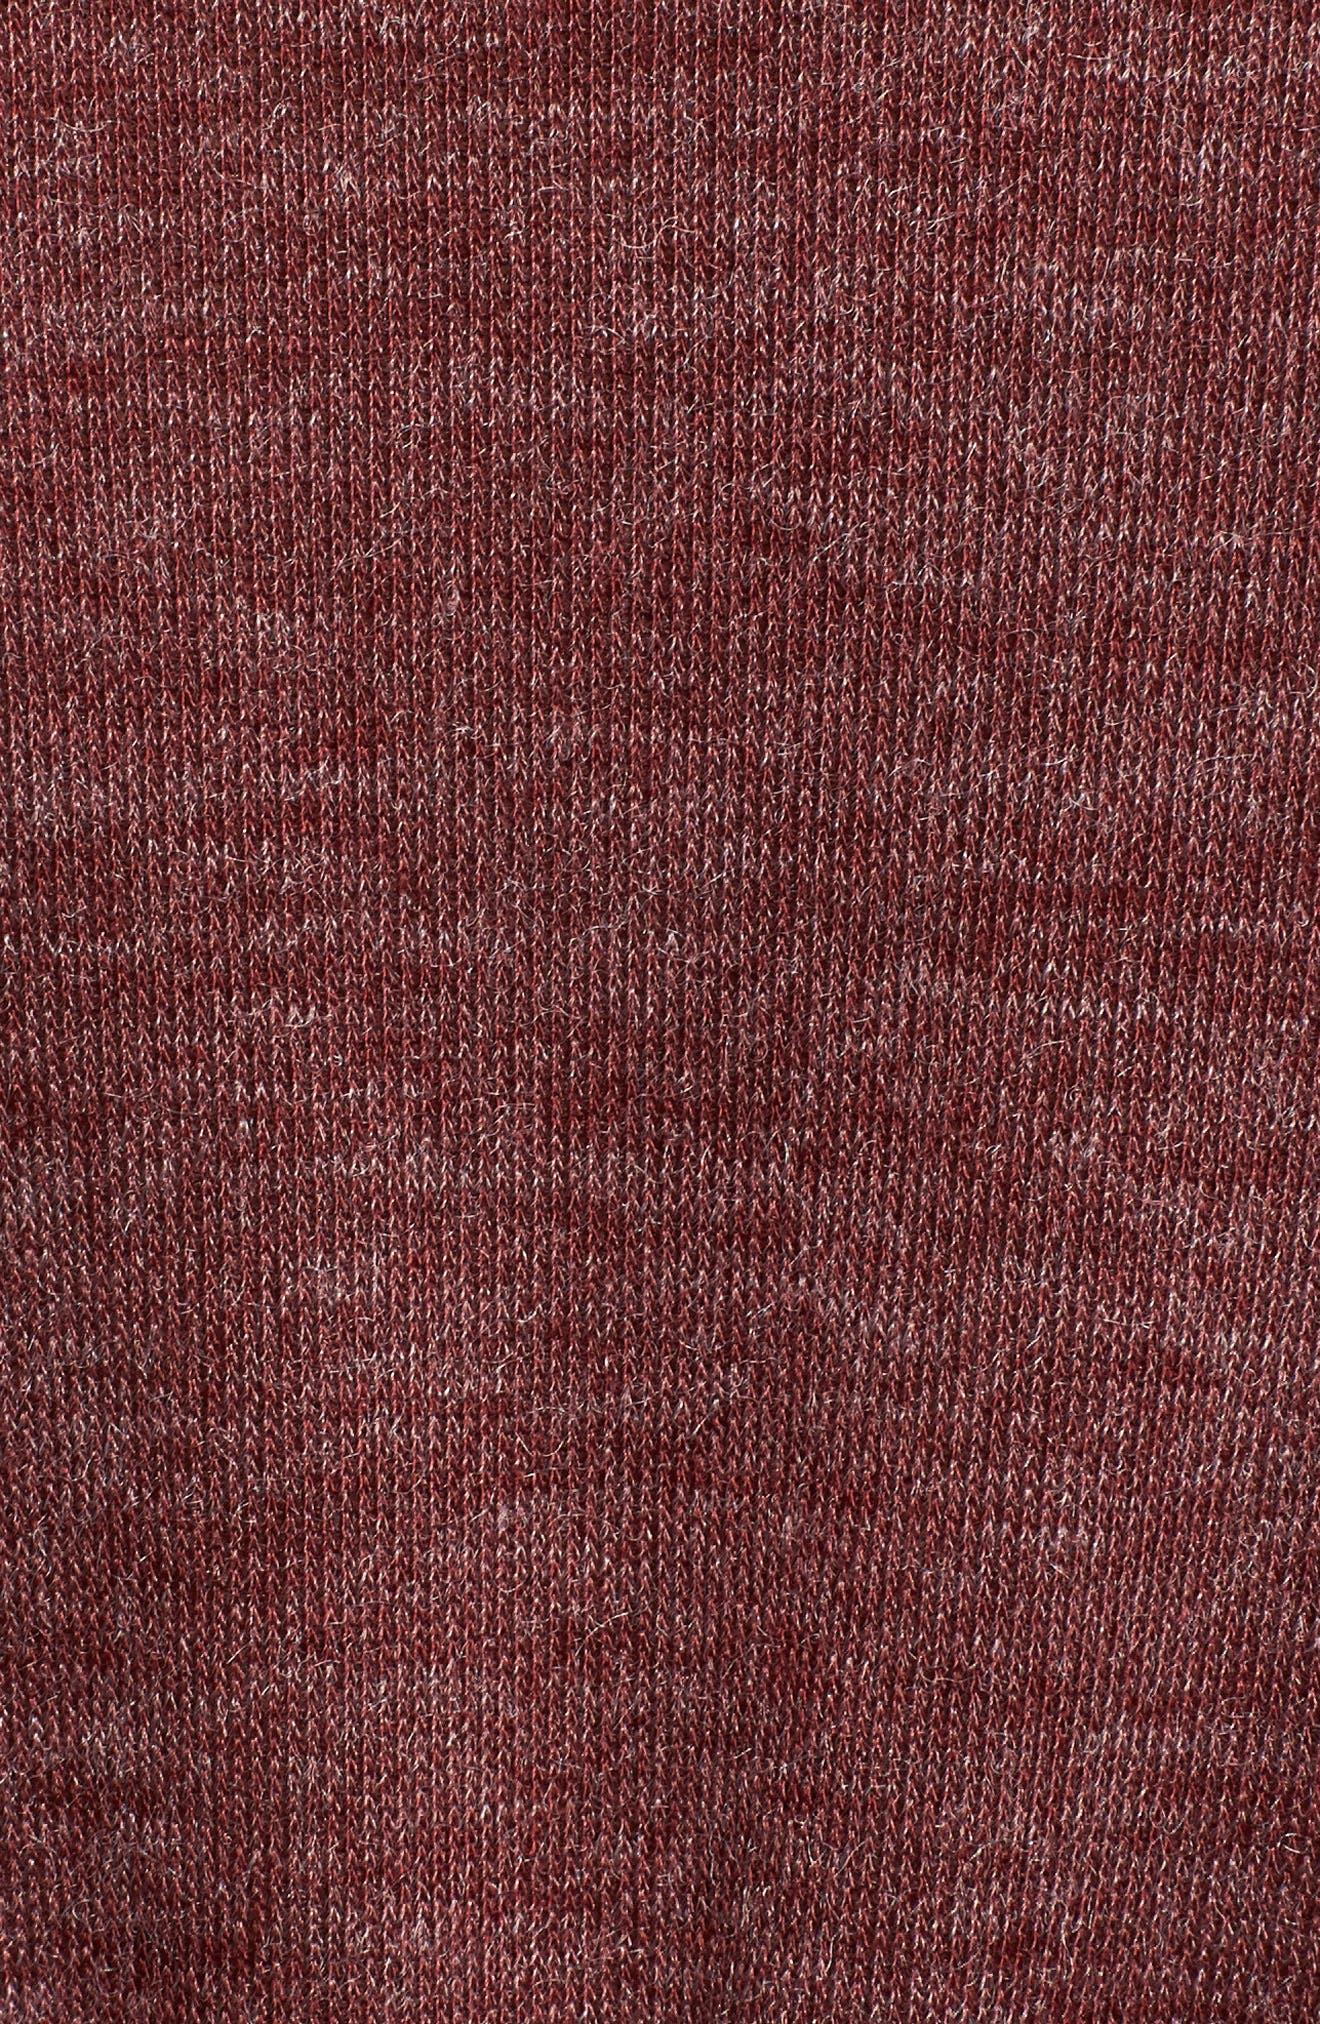 Cowl Neck Dress,                             Alternate thumbnail 5, color,                             930